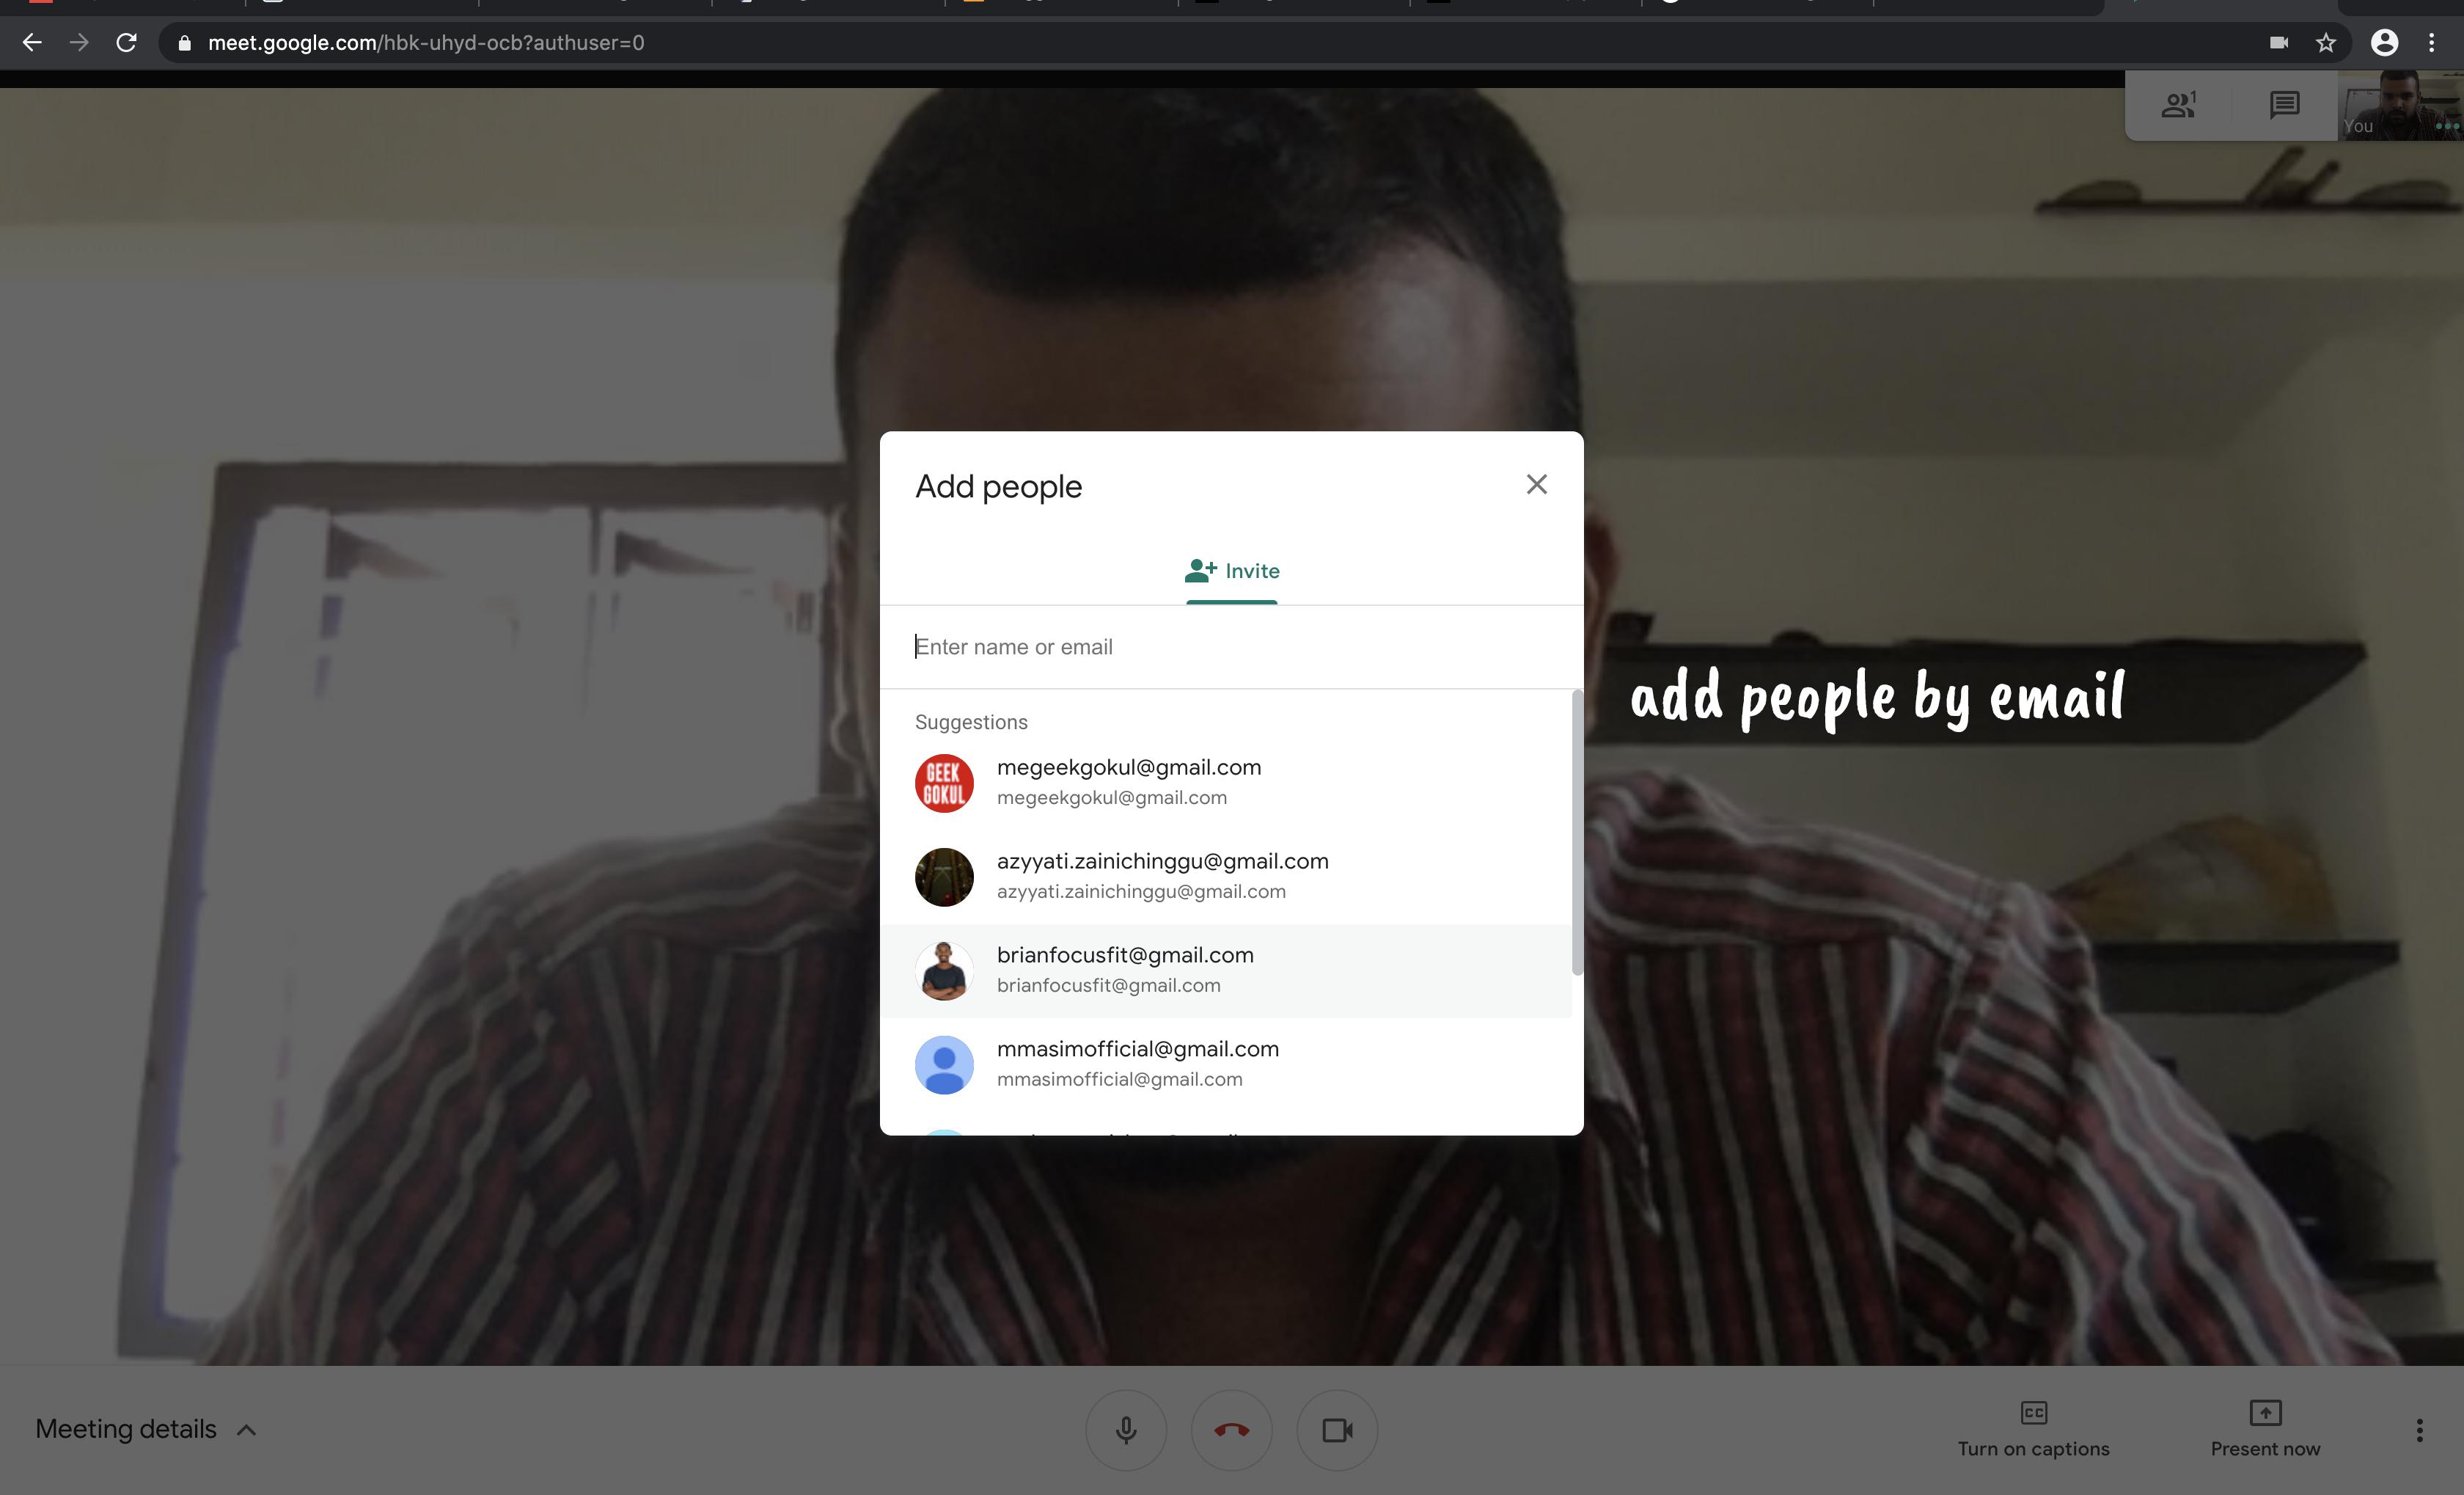 Google Meet add people